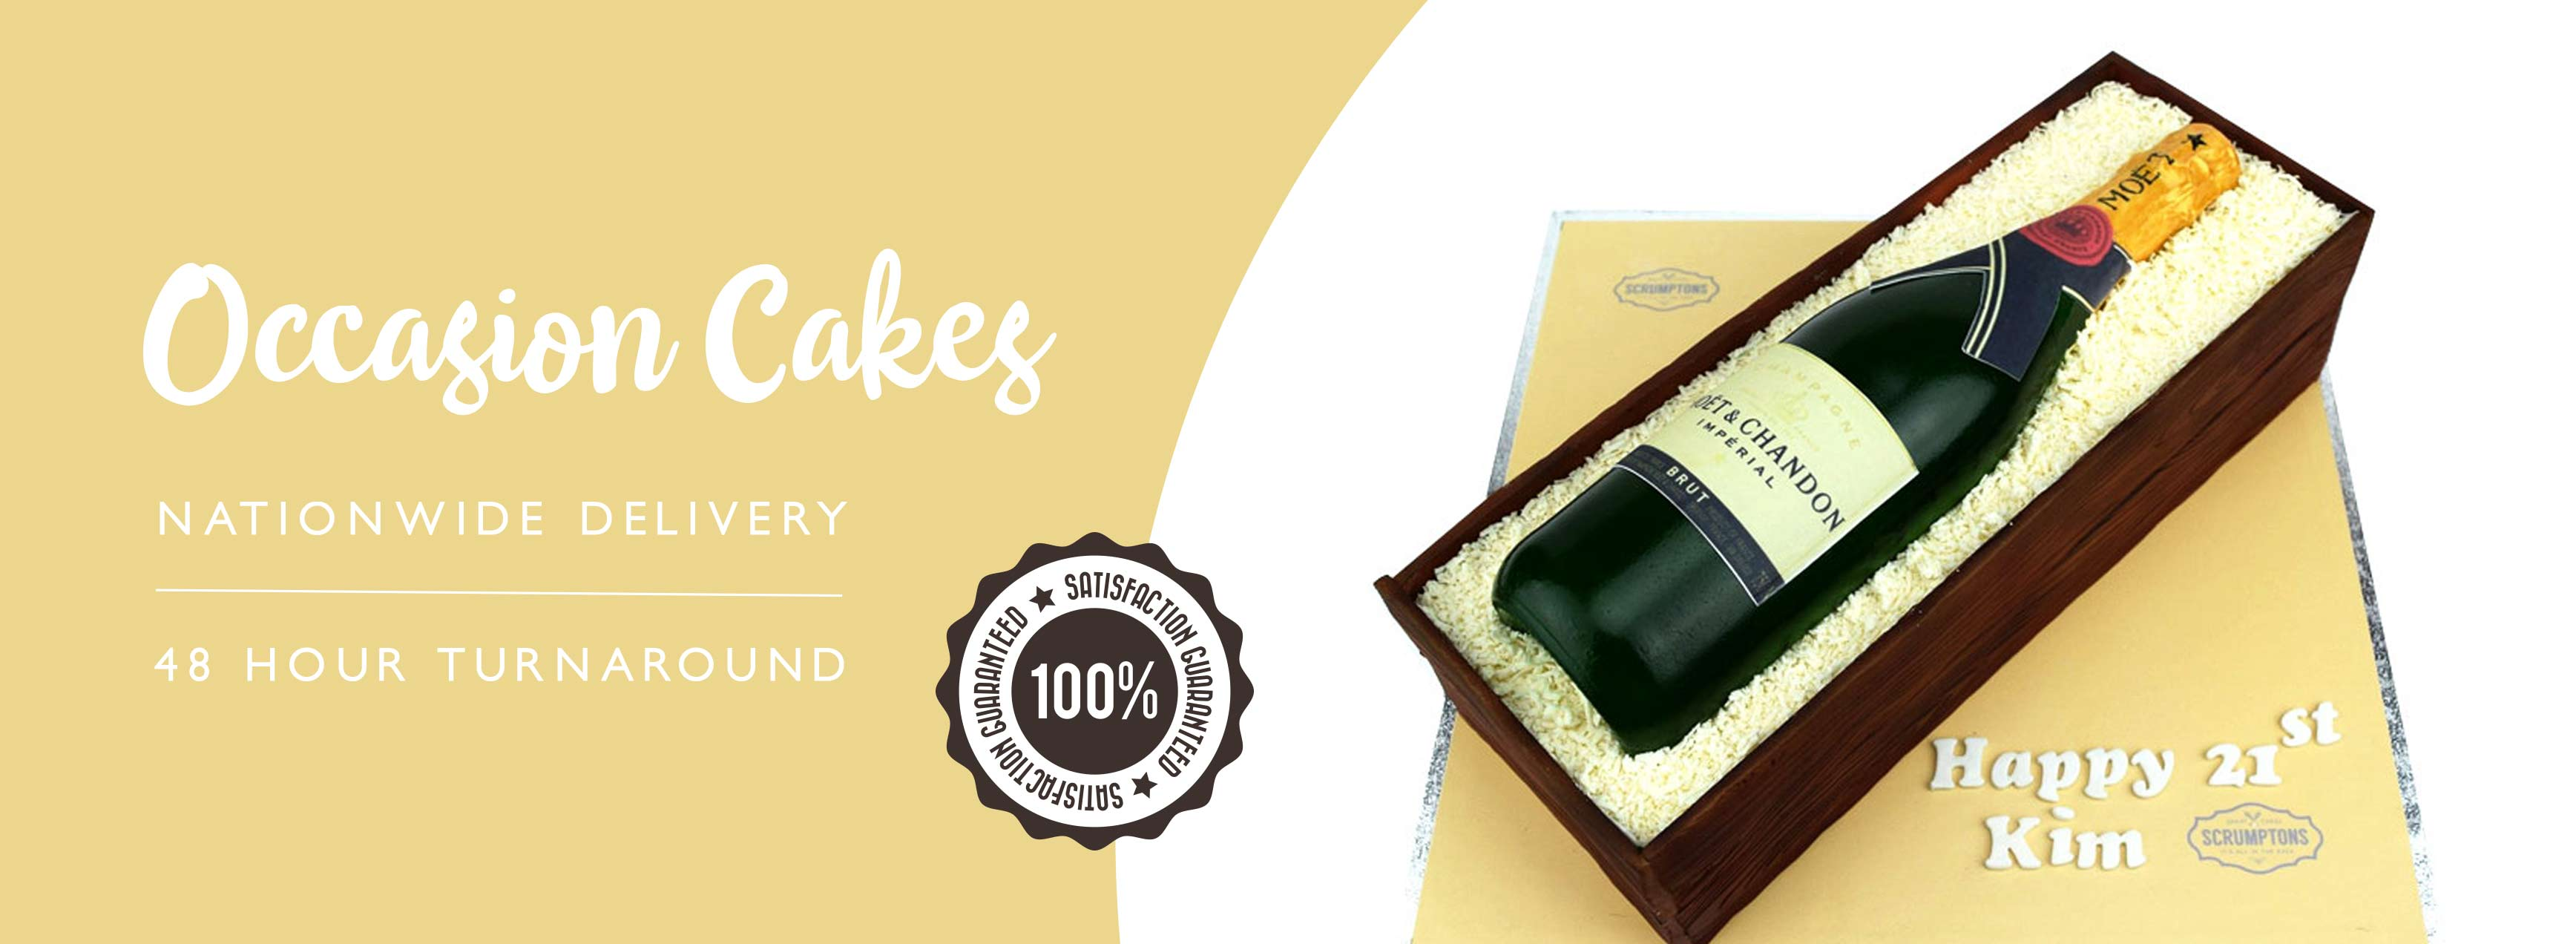 3DCakeStore-Slider---Occasion-Cakes-1